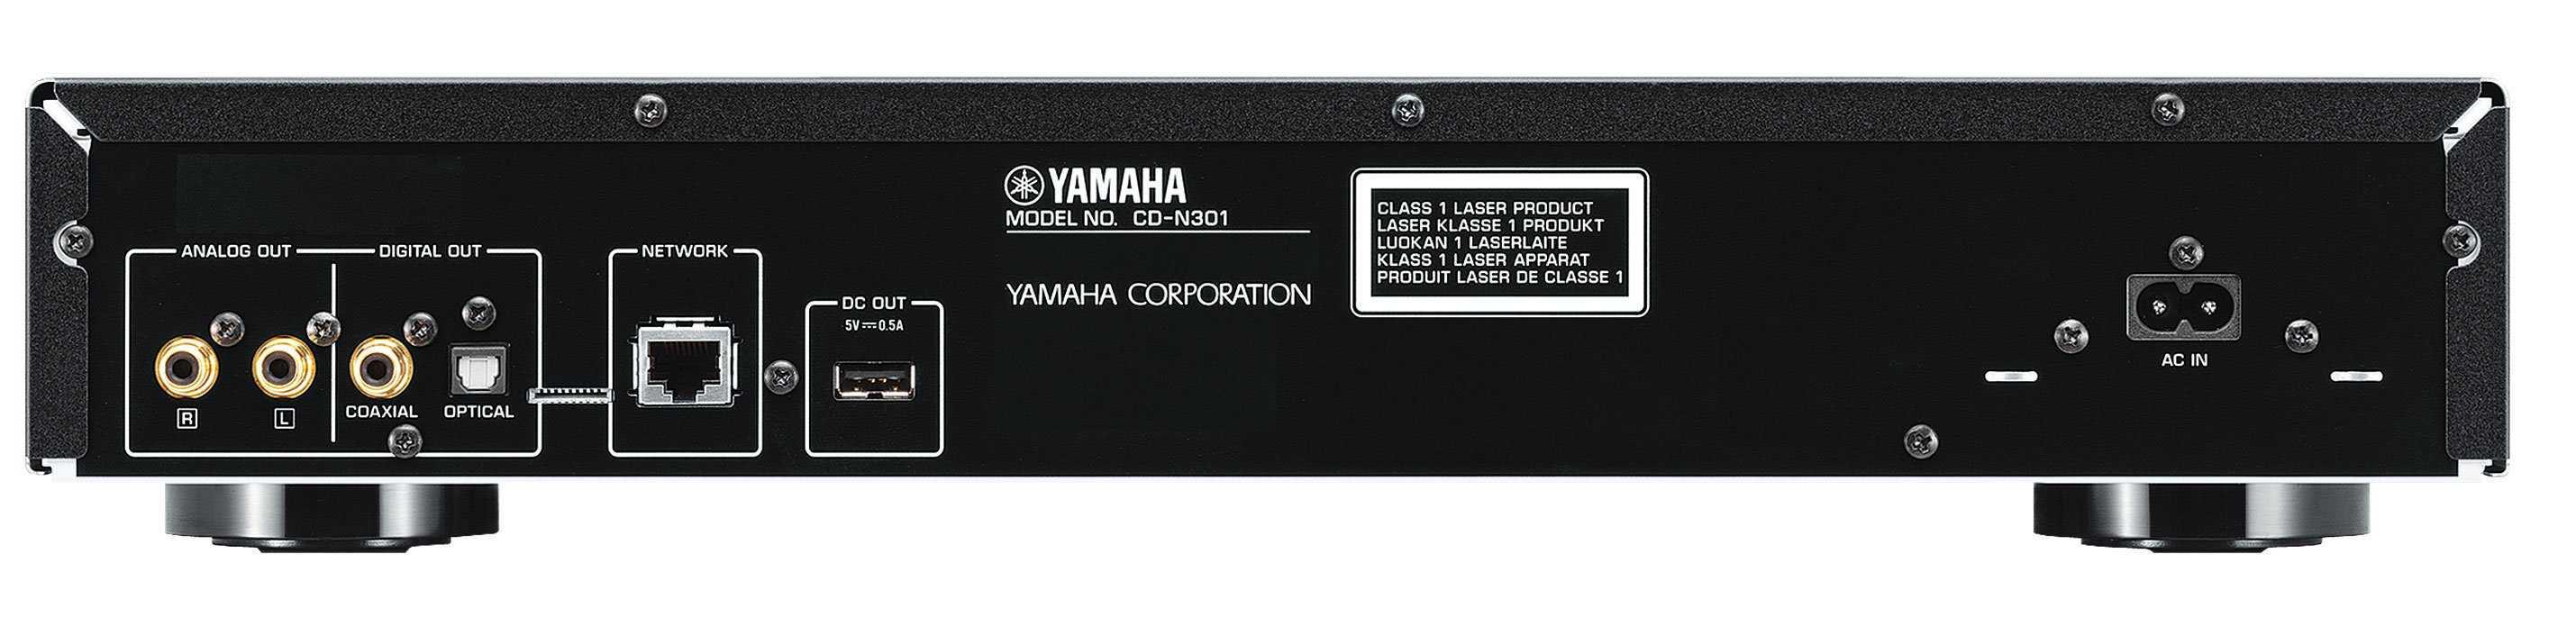 Yamaha CDN301 Rueckseite  Heimkinopartner Bremen